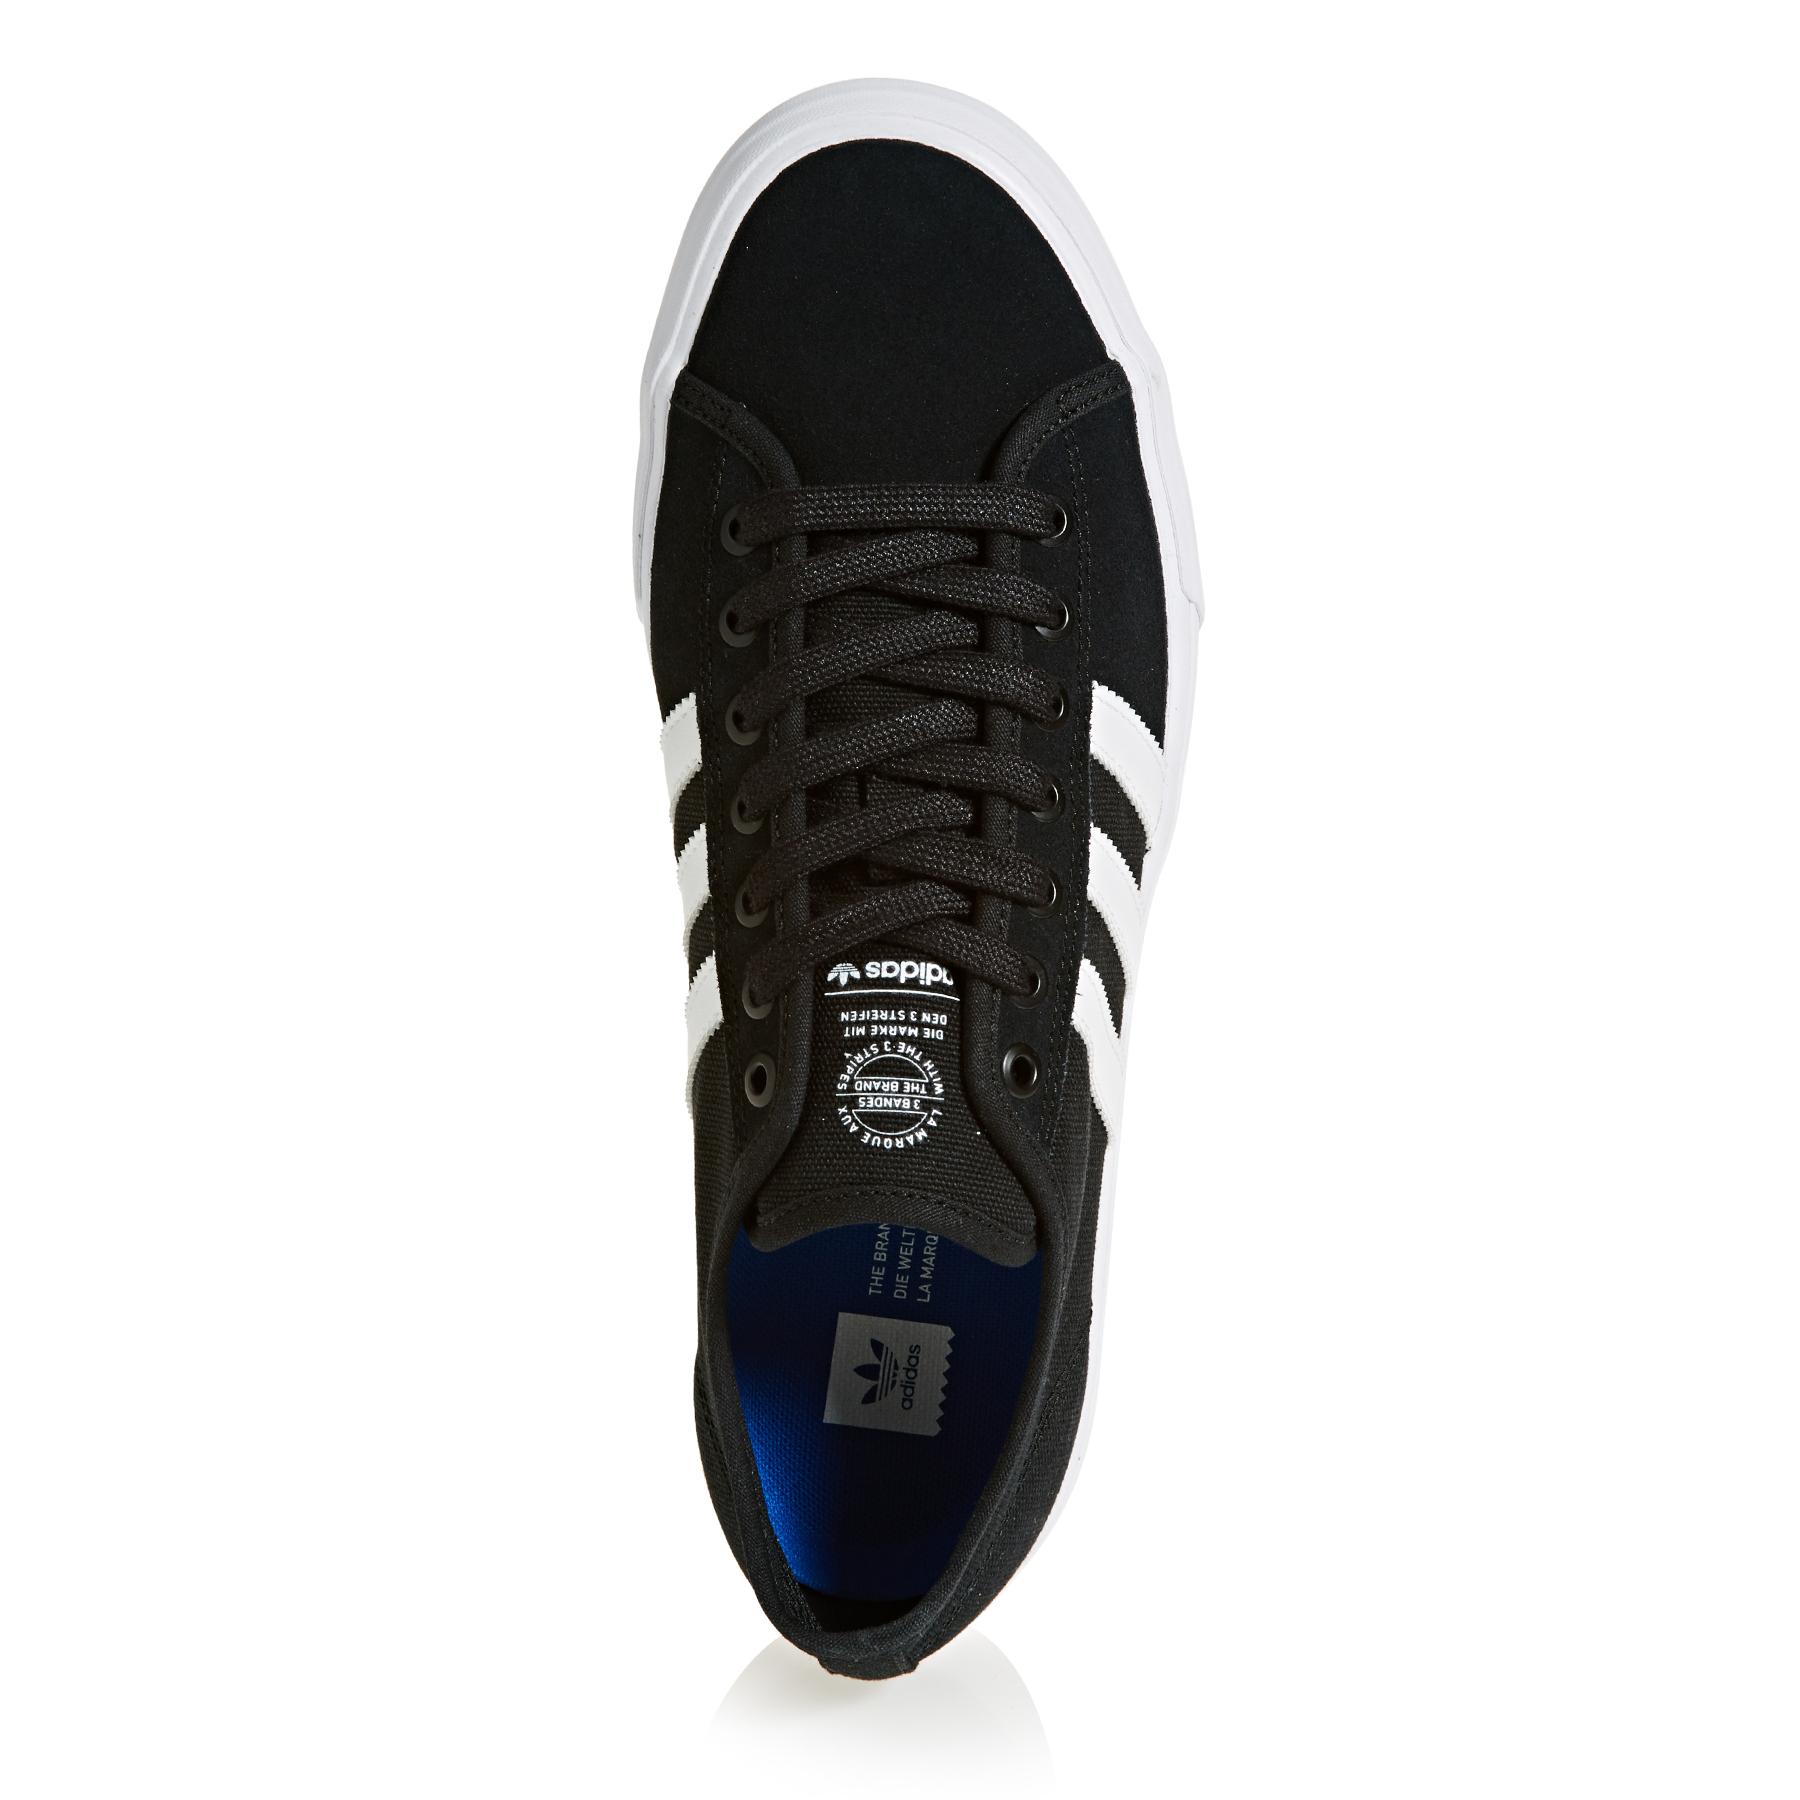 Details about Adidas Matchcourt RX Skate Trainers Shoes BlackWhite UK Size 6,7,8,9,10,11